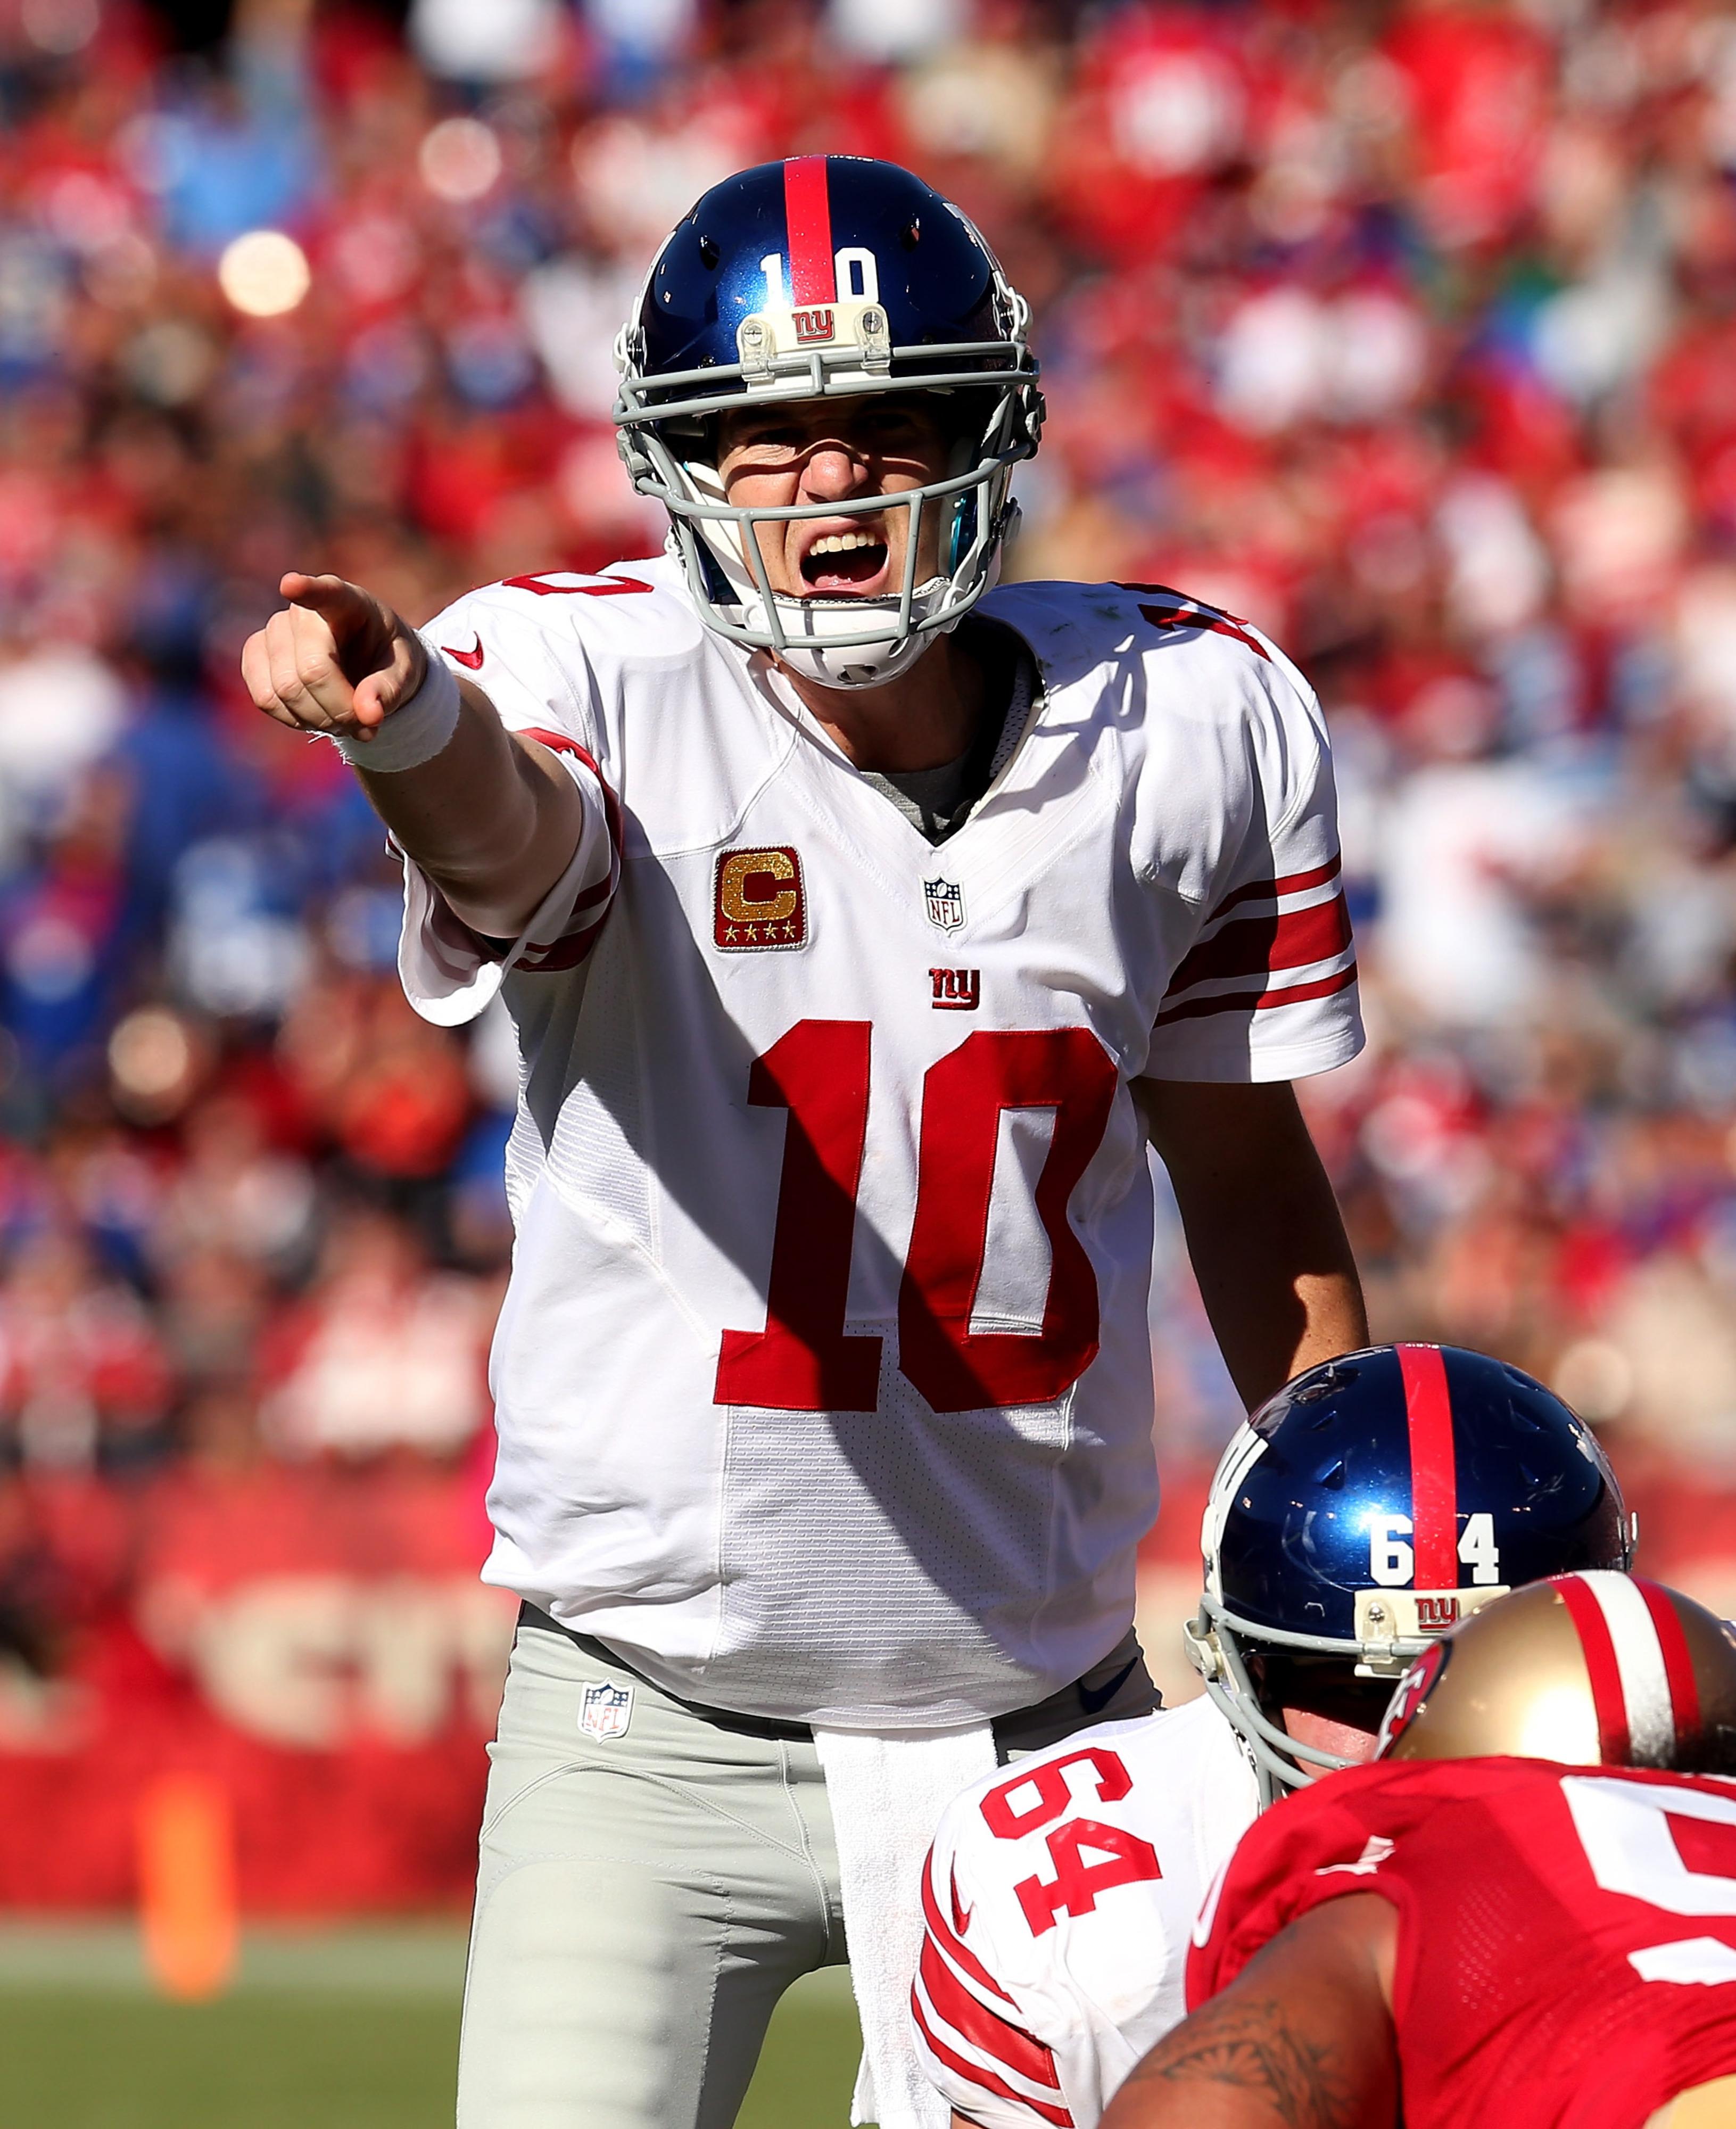 New York Giants' quarterback Eli Manning.